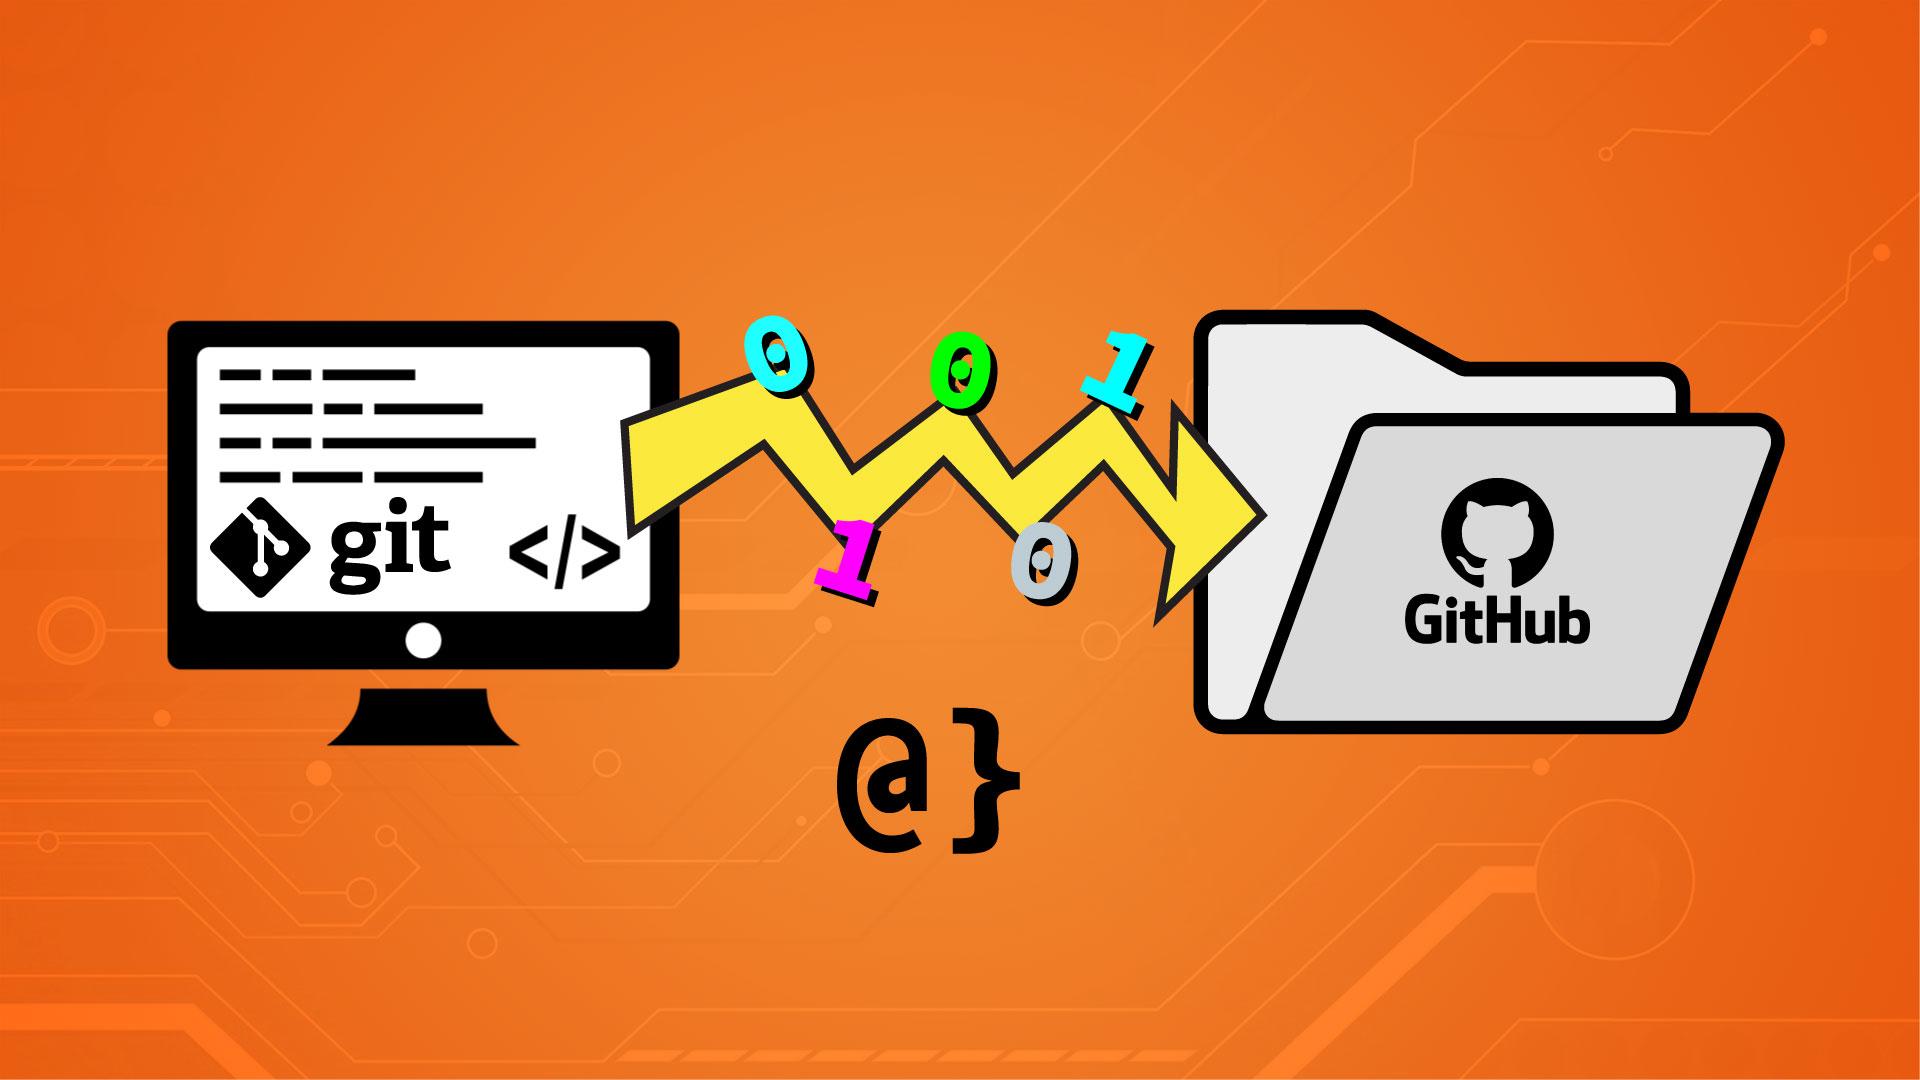 github push existing project to github